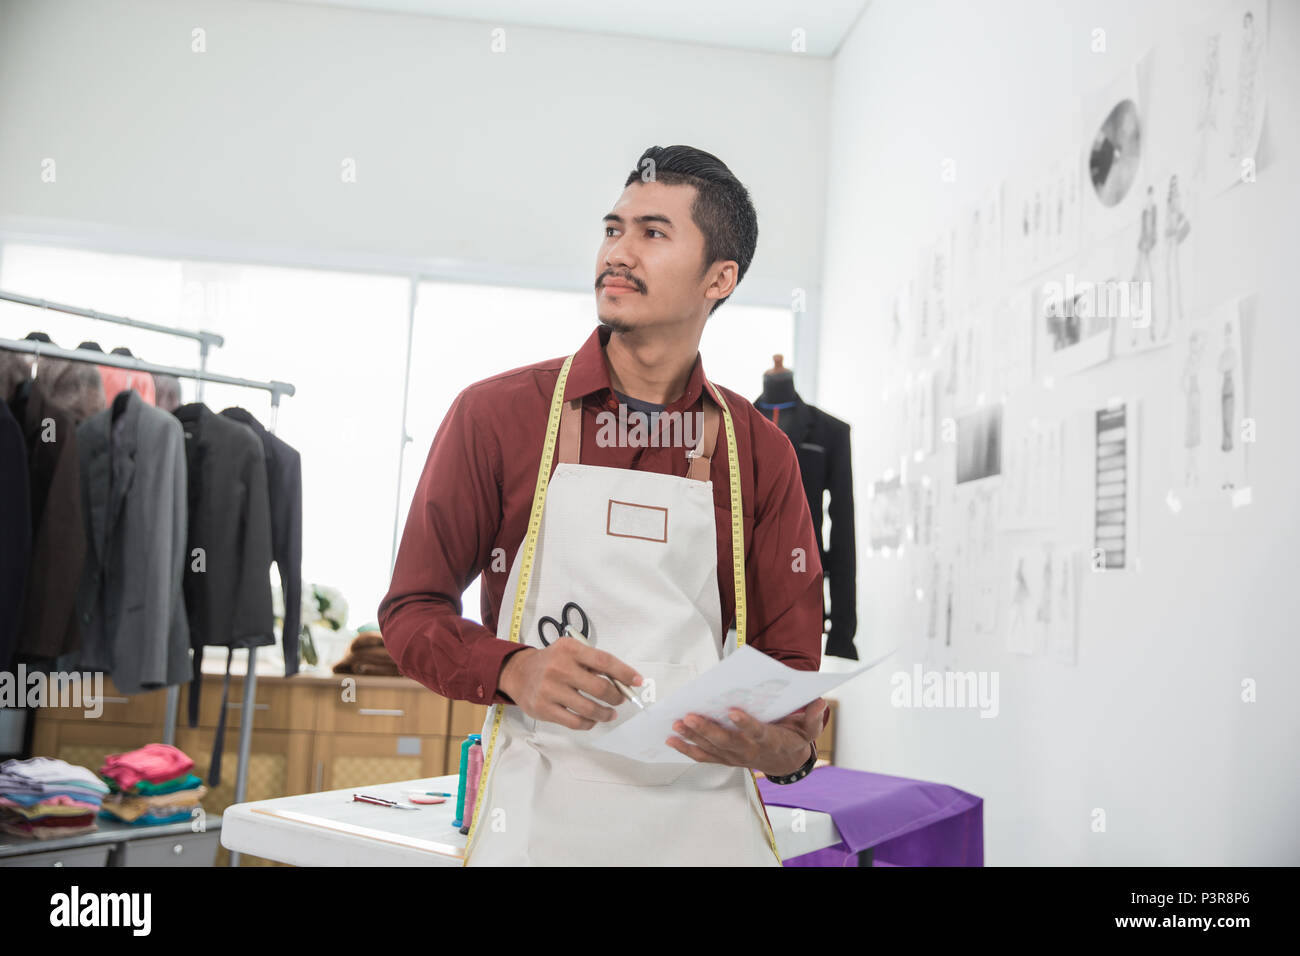 Asian Clothing Designers   Asian Male Fashion Designer Stock Photo 208880174 Alamy